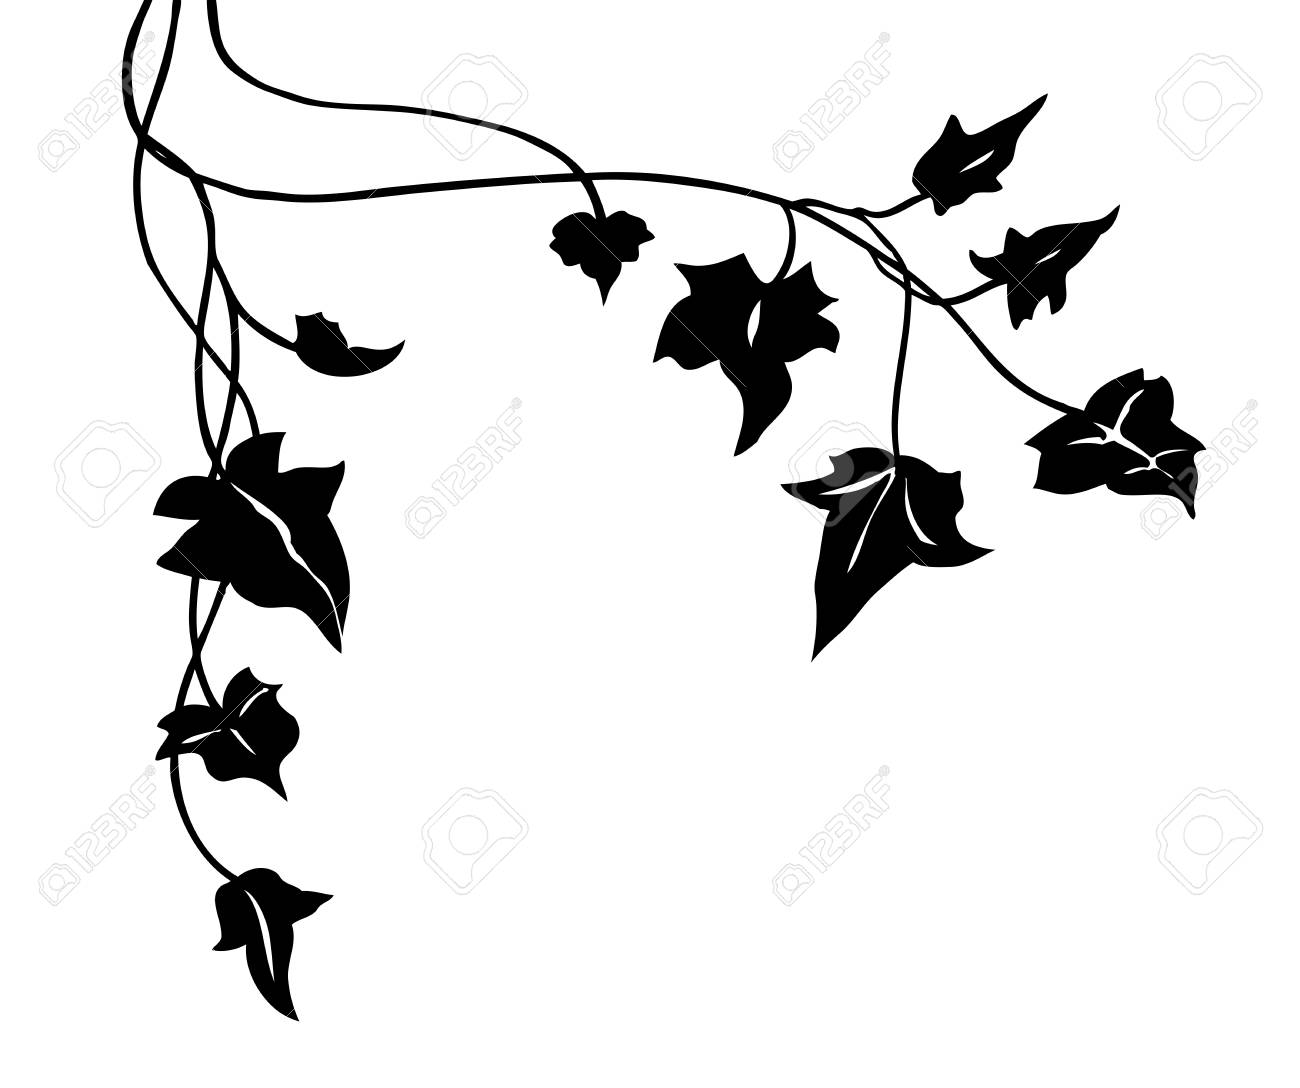 ivy vine silhouette vector, elegant black floral decorative border